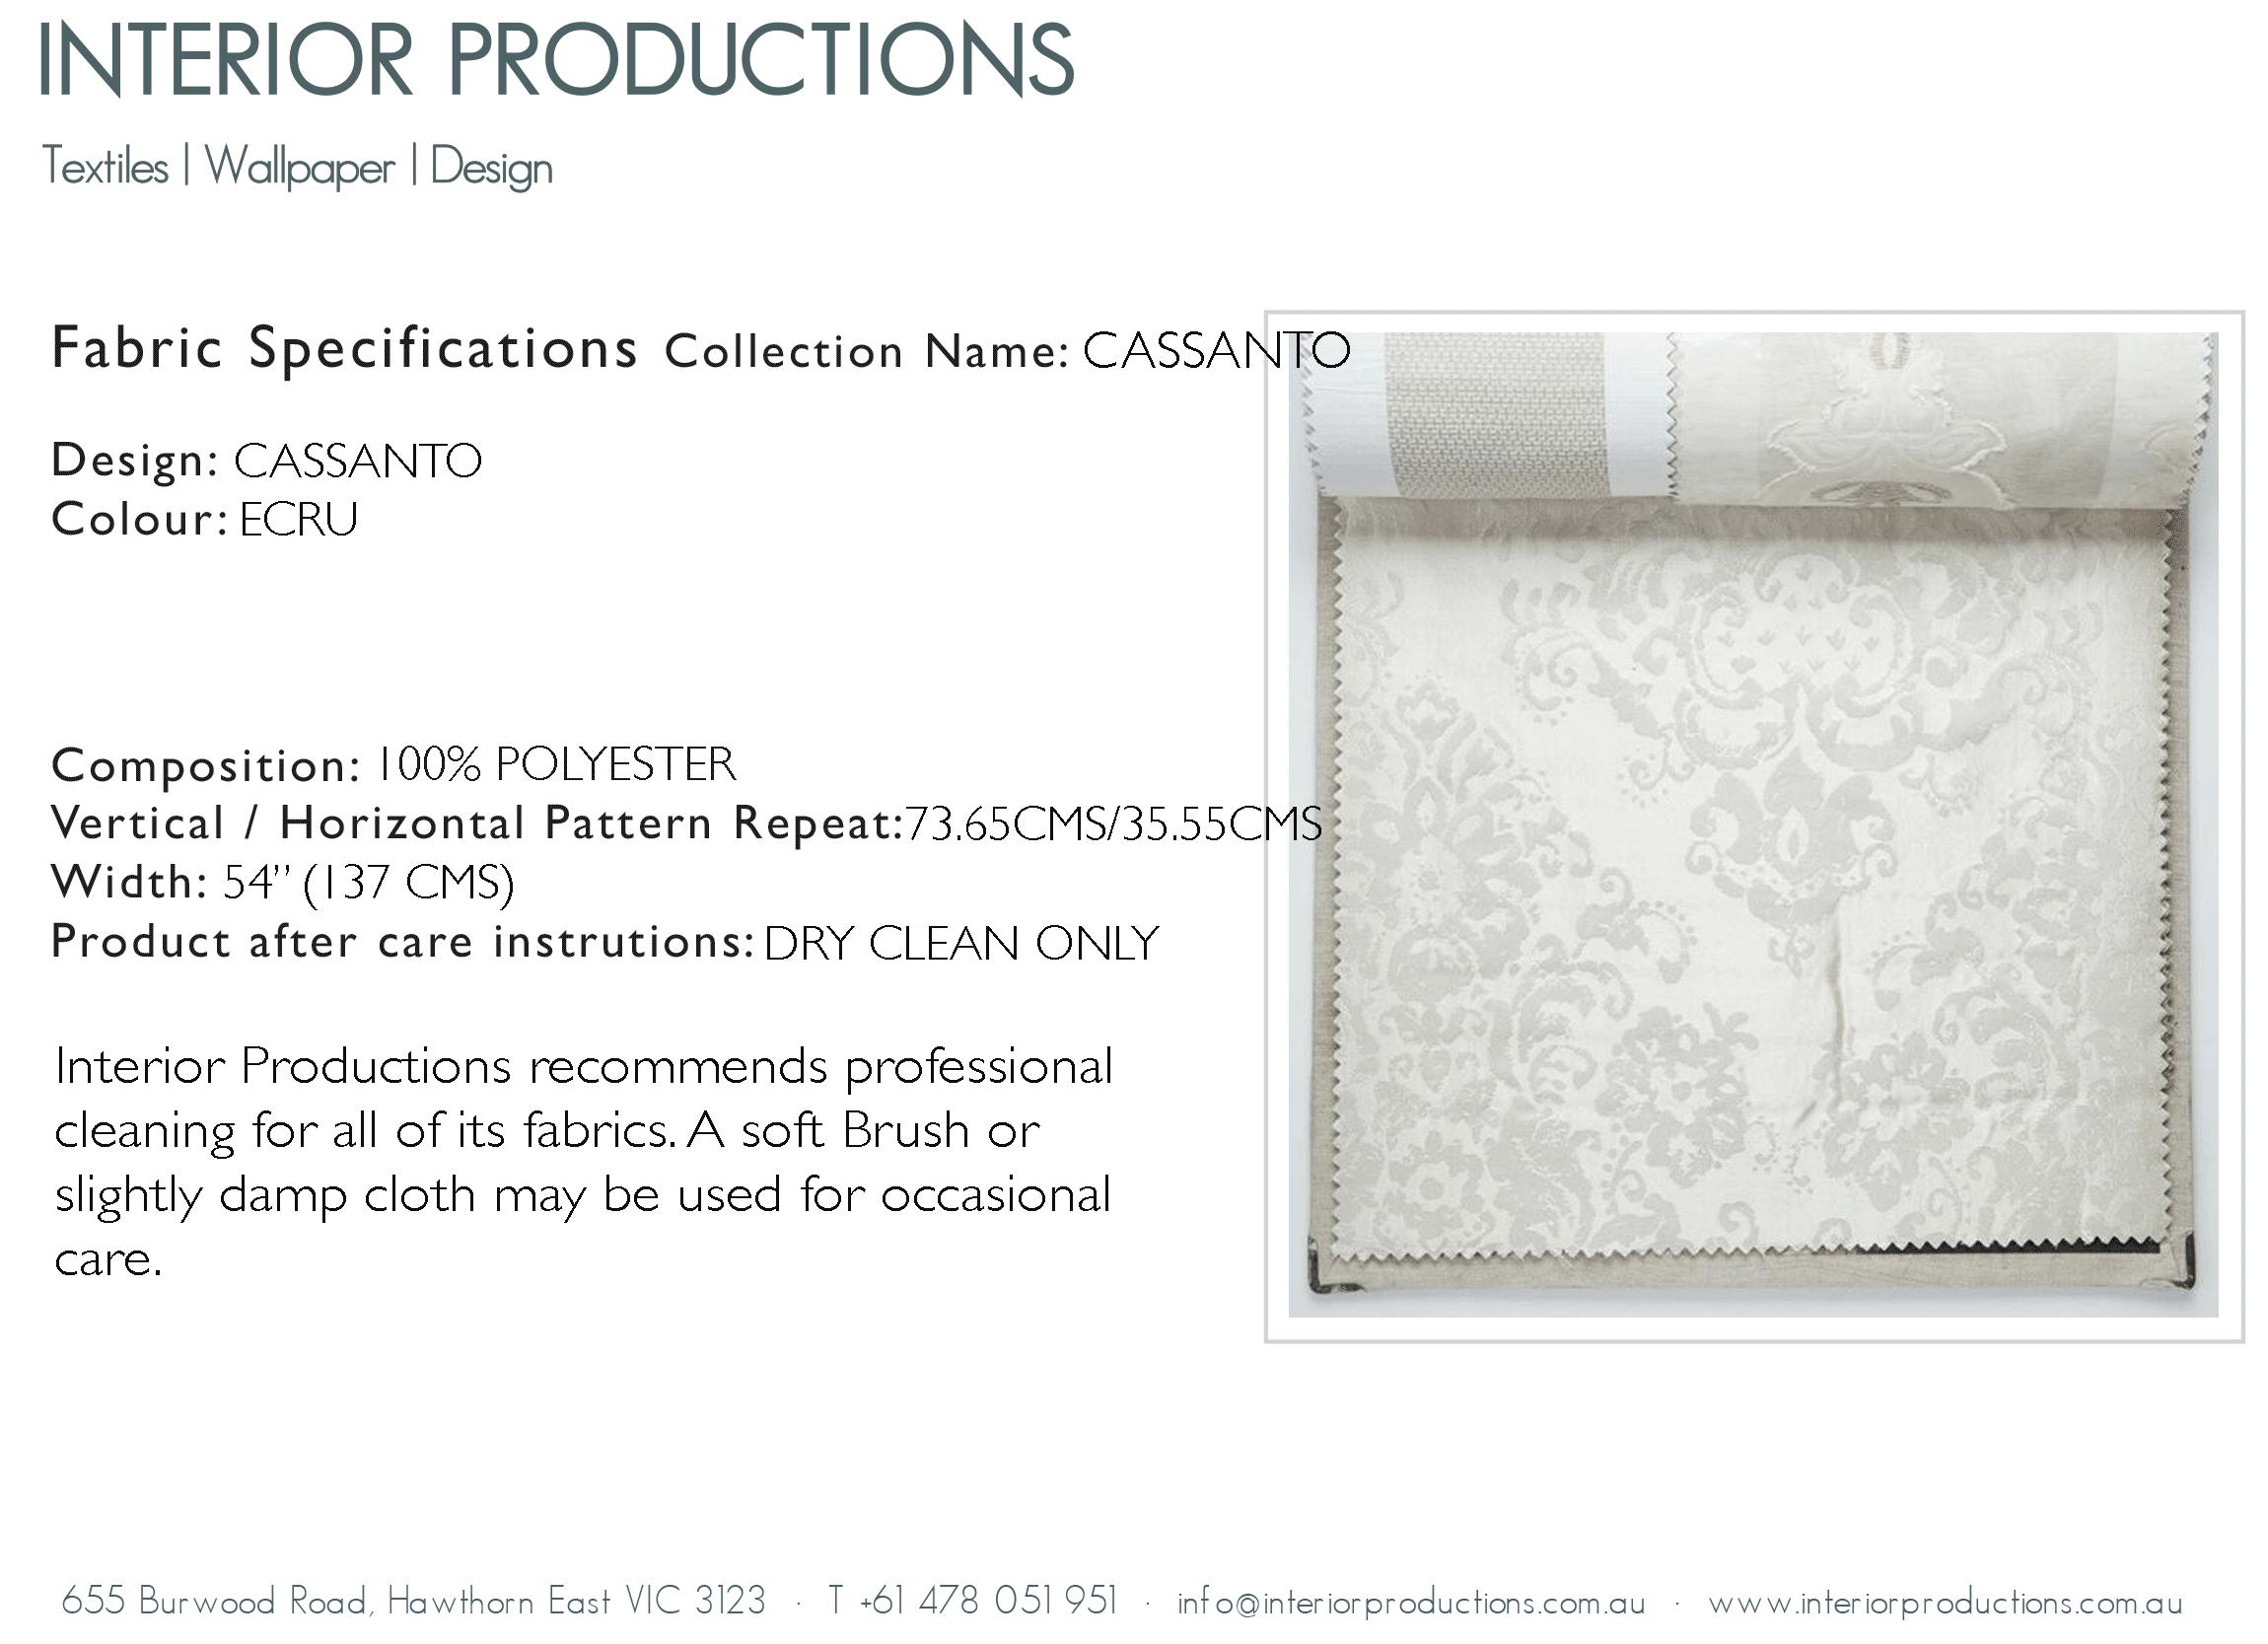 interior_productions_CASSANTO---ECRU